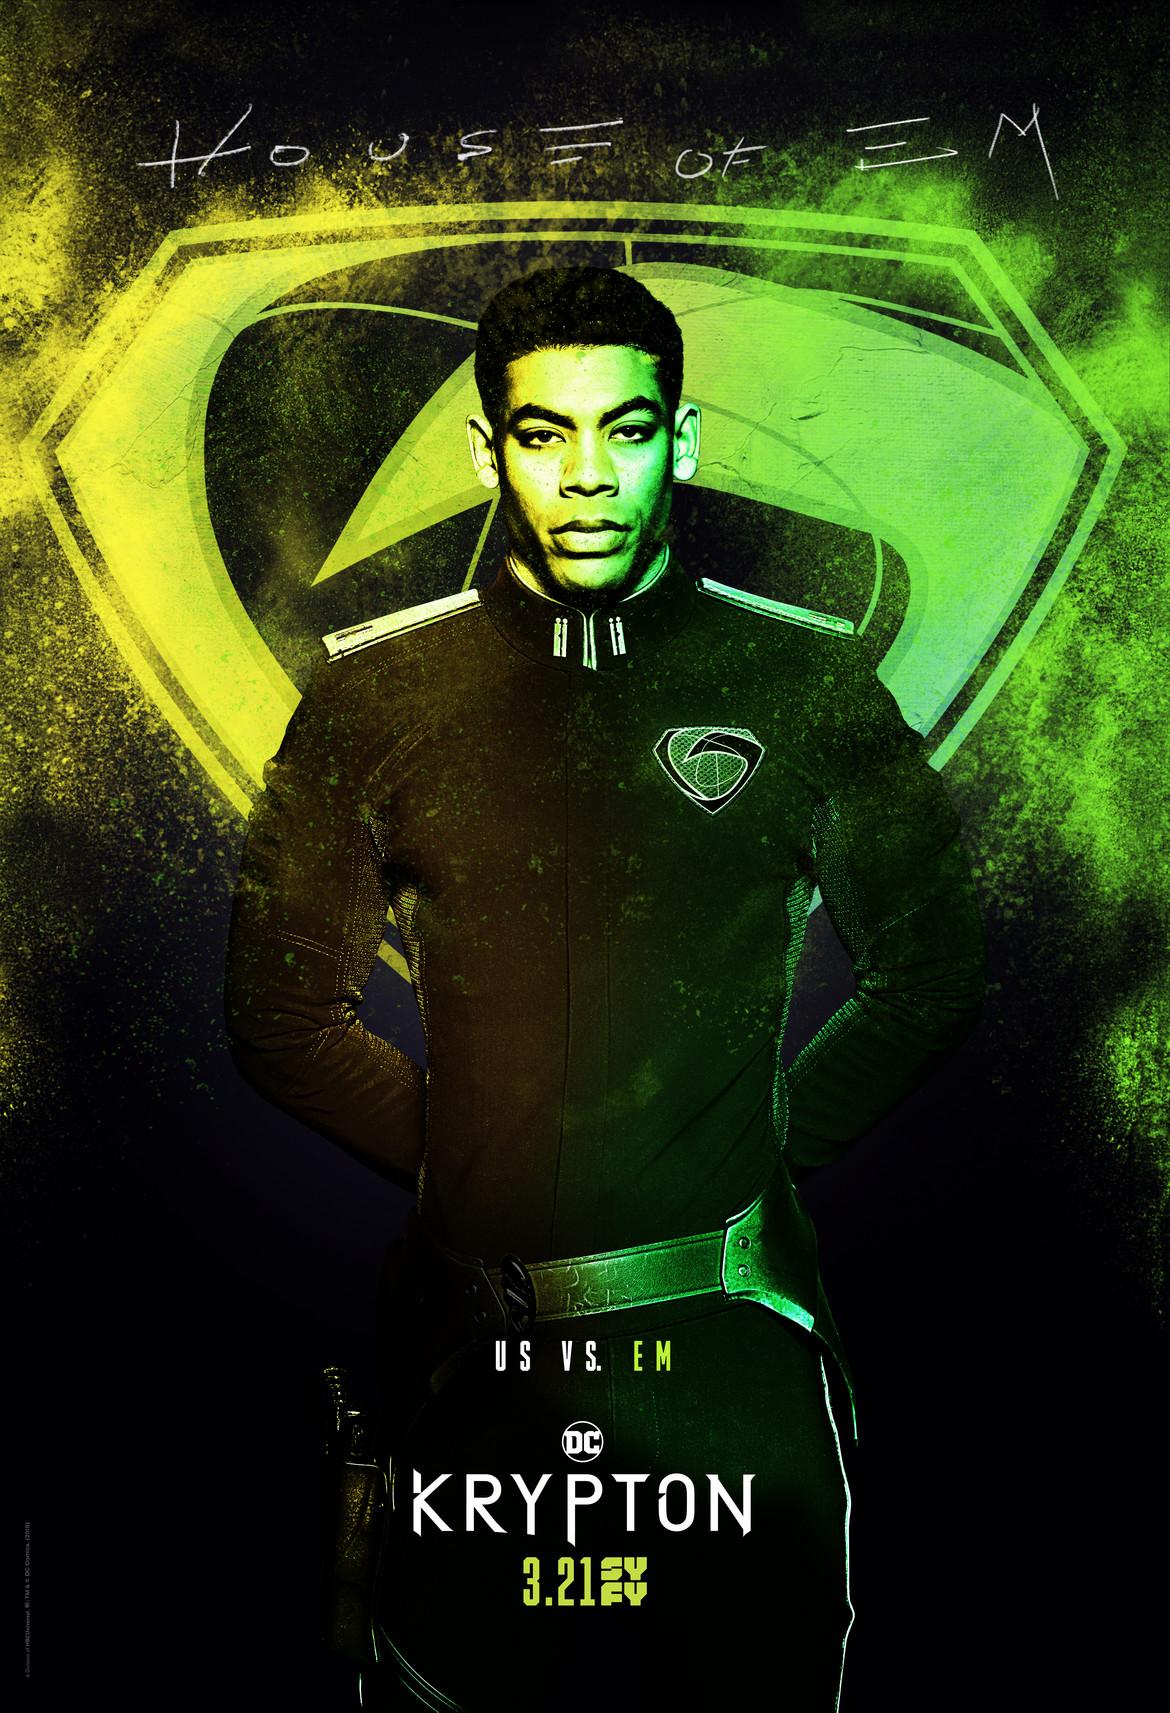 Krypton- Em Spraypaint poster